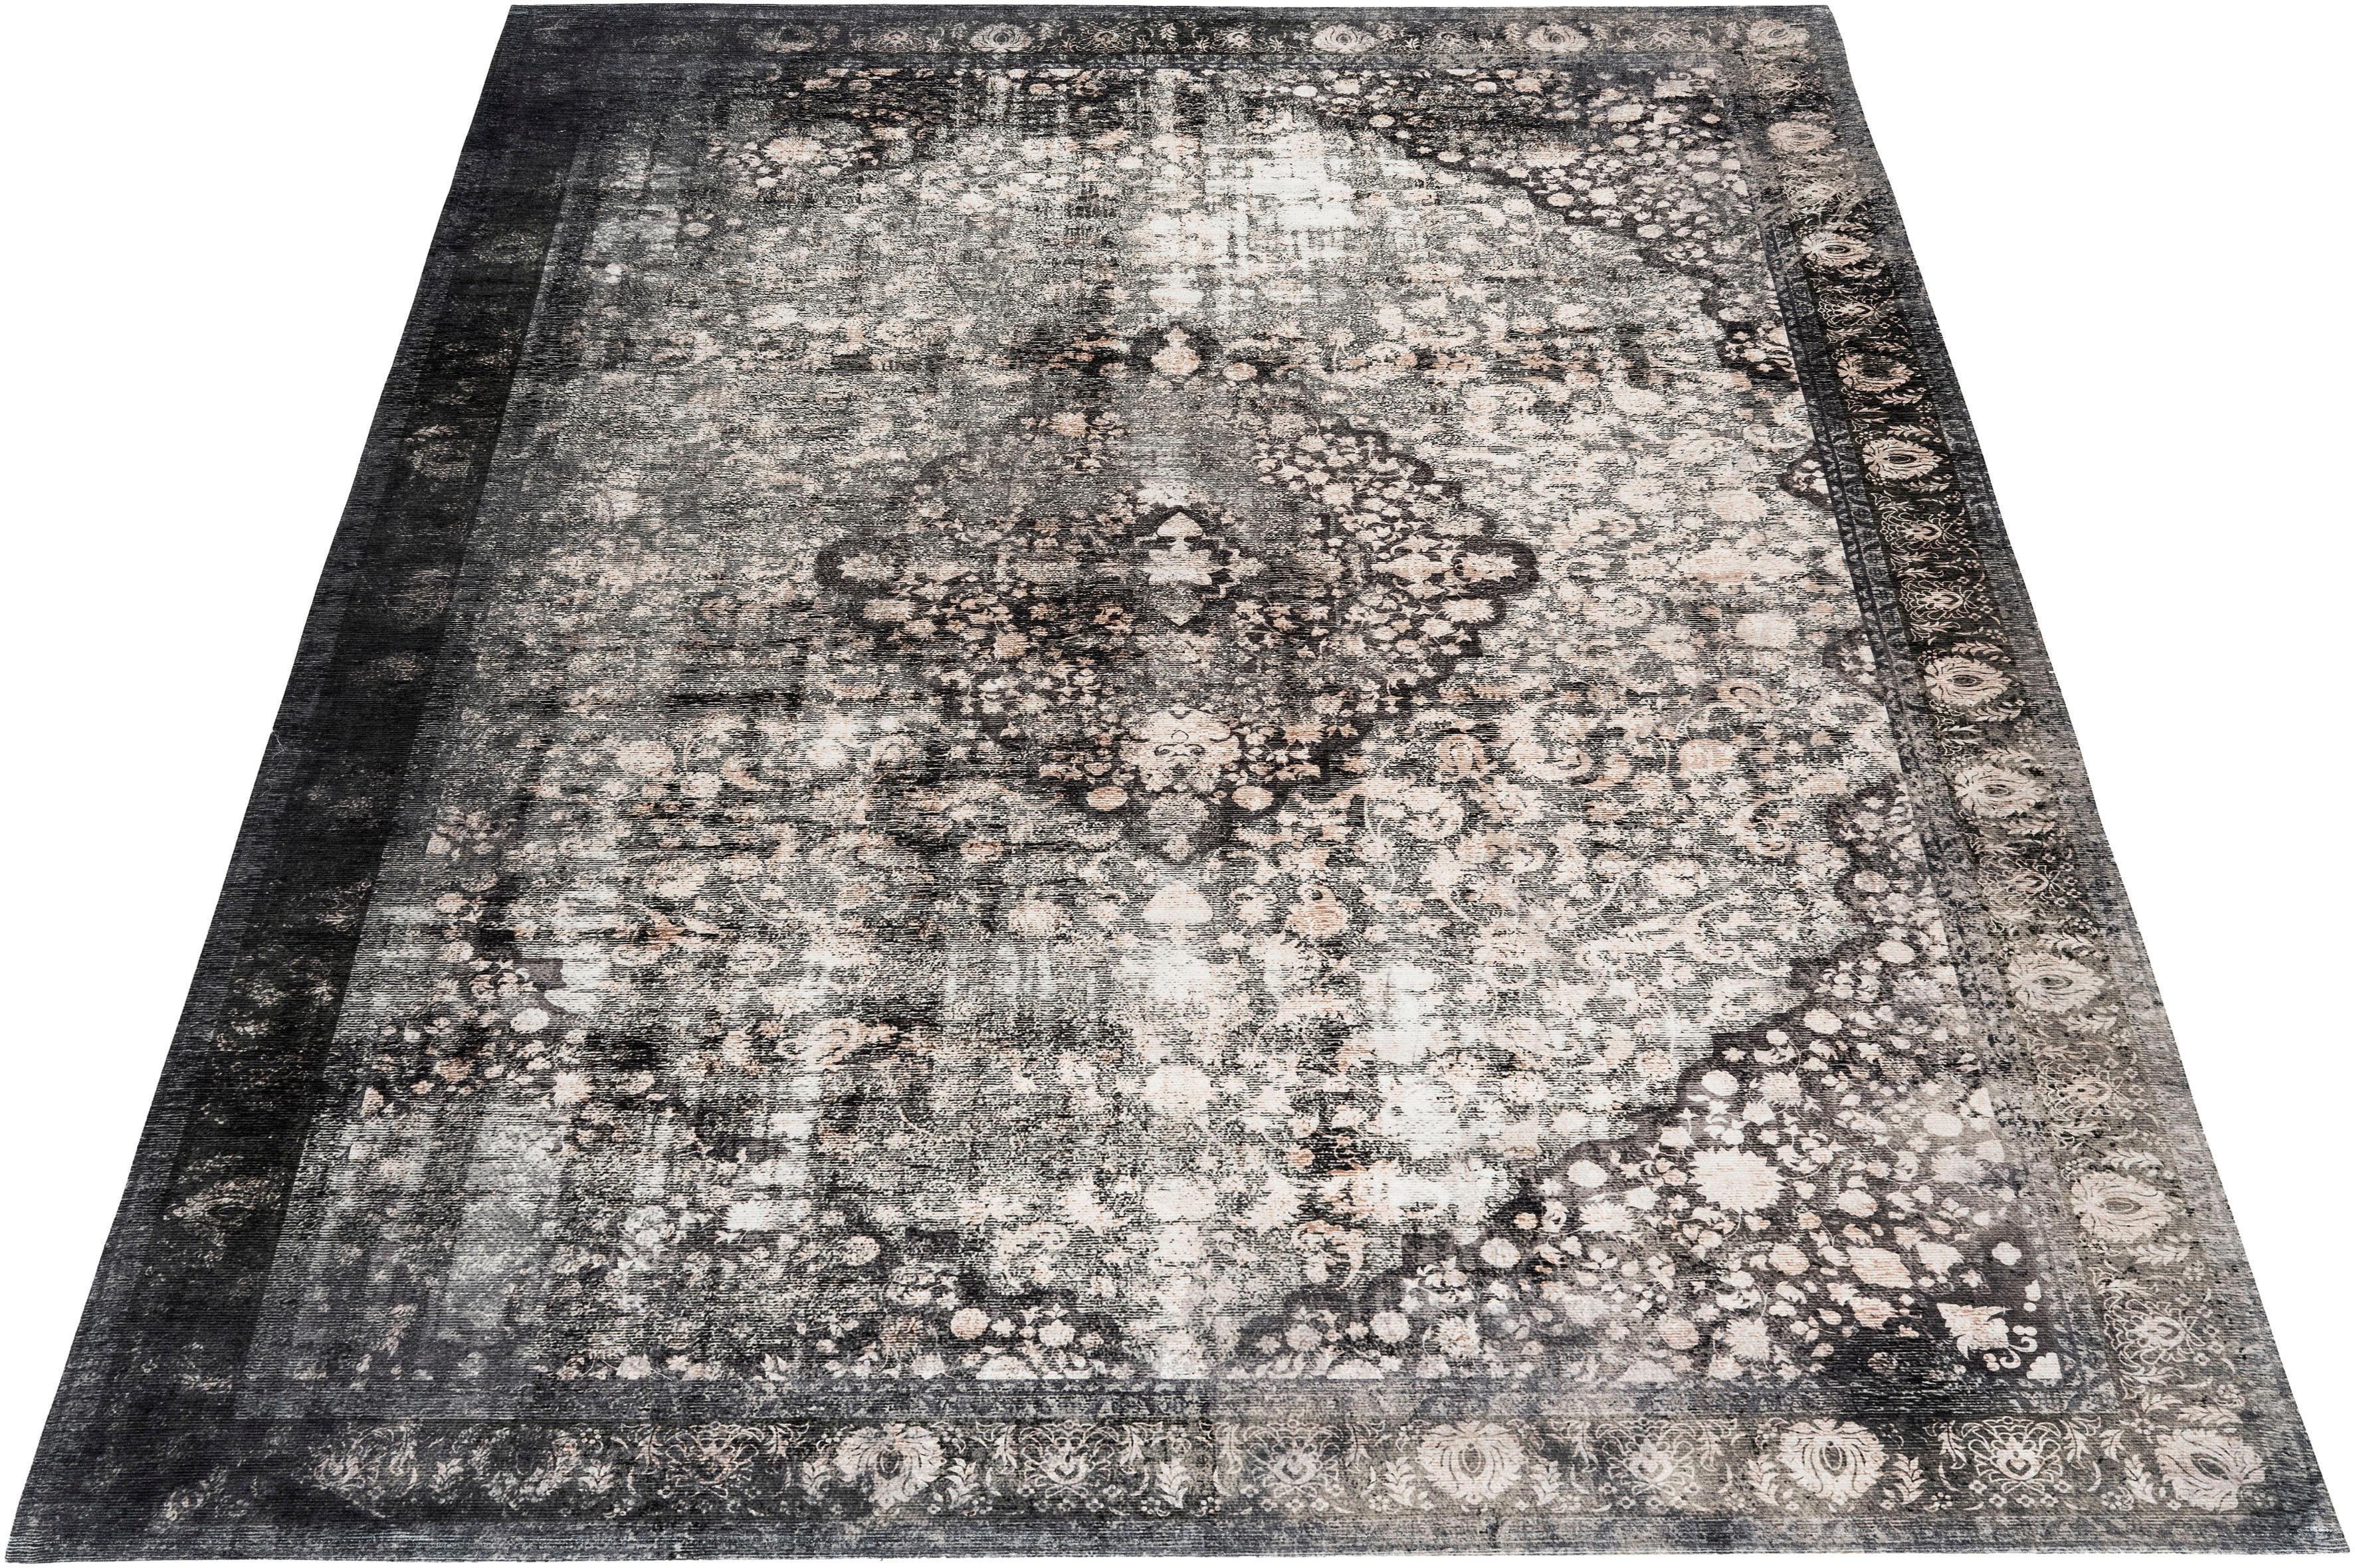 Teppich Avino Leonique rechteckig Höhe 9 mm maschinell gewebt